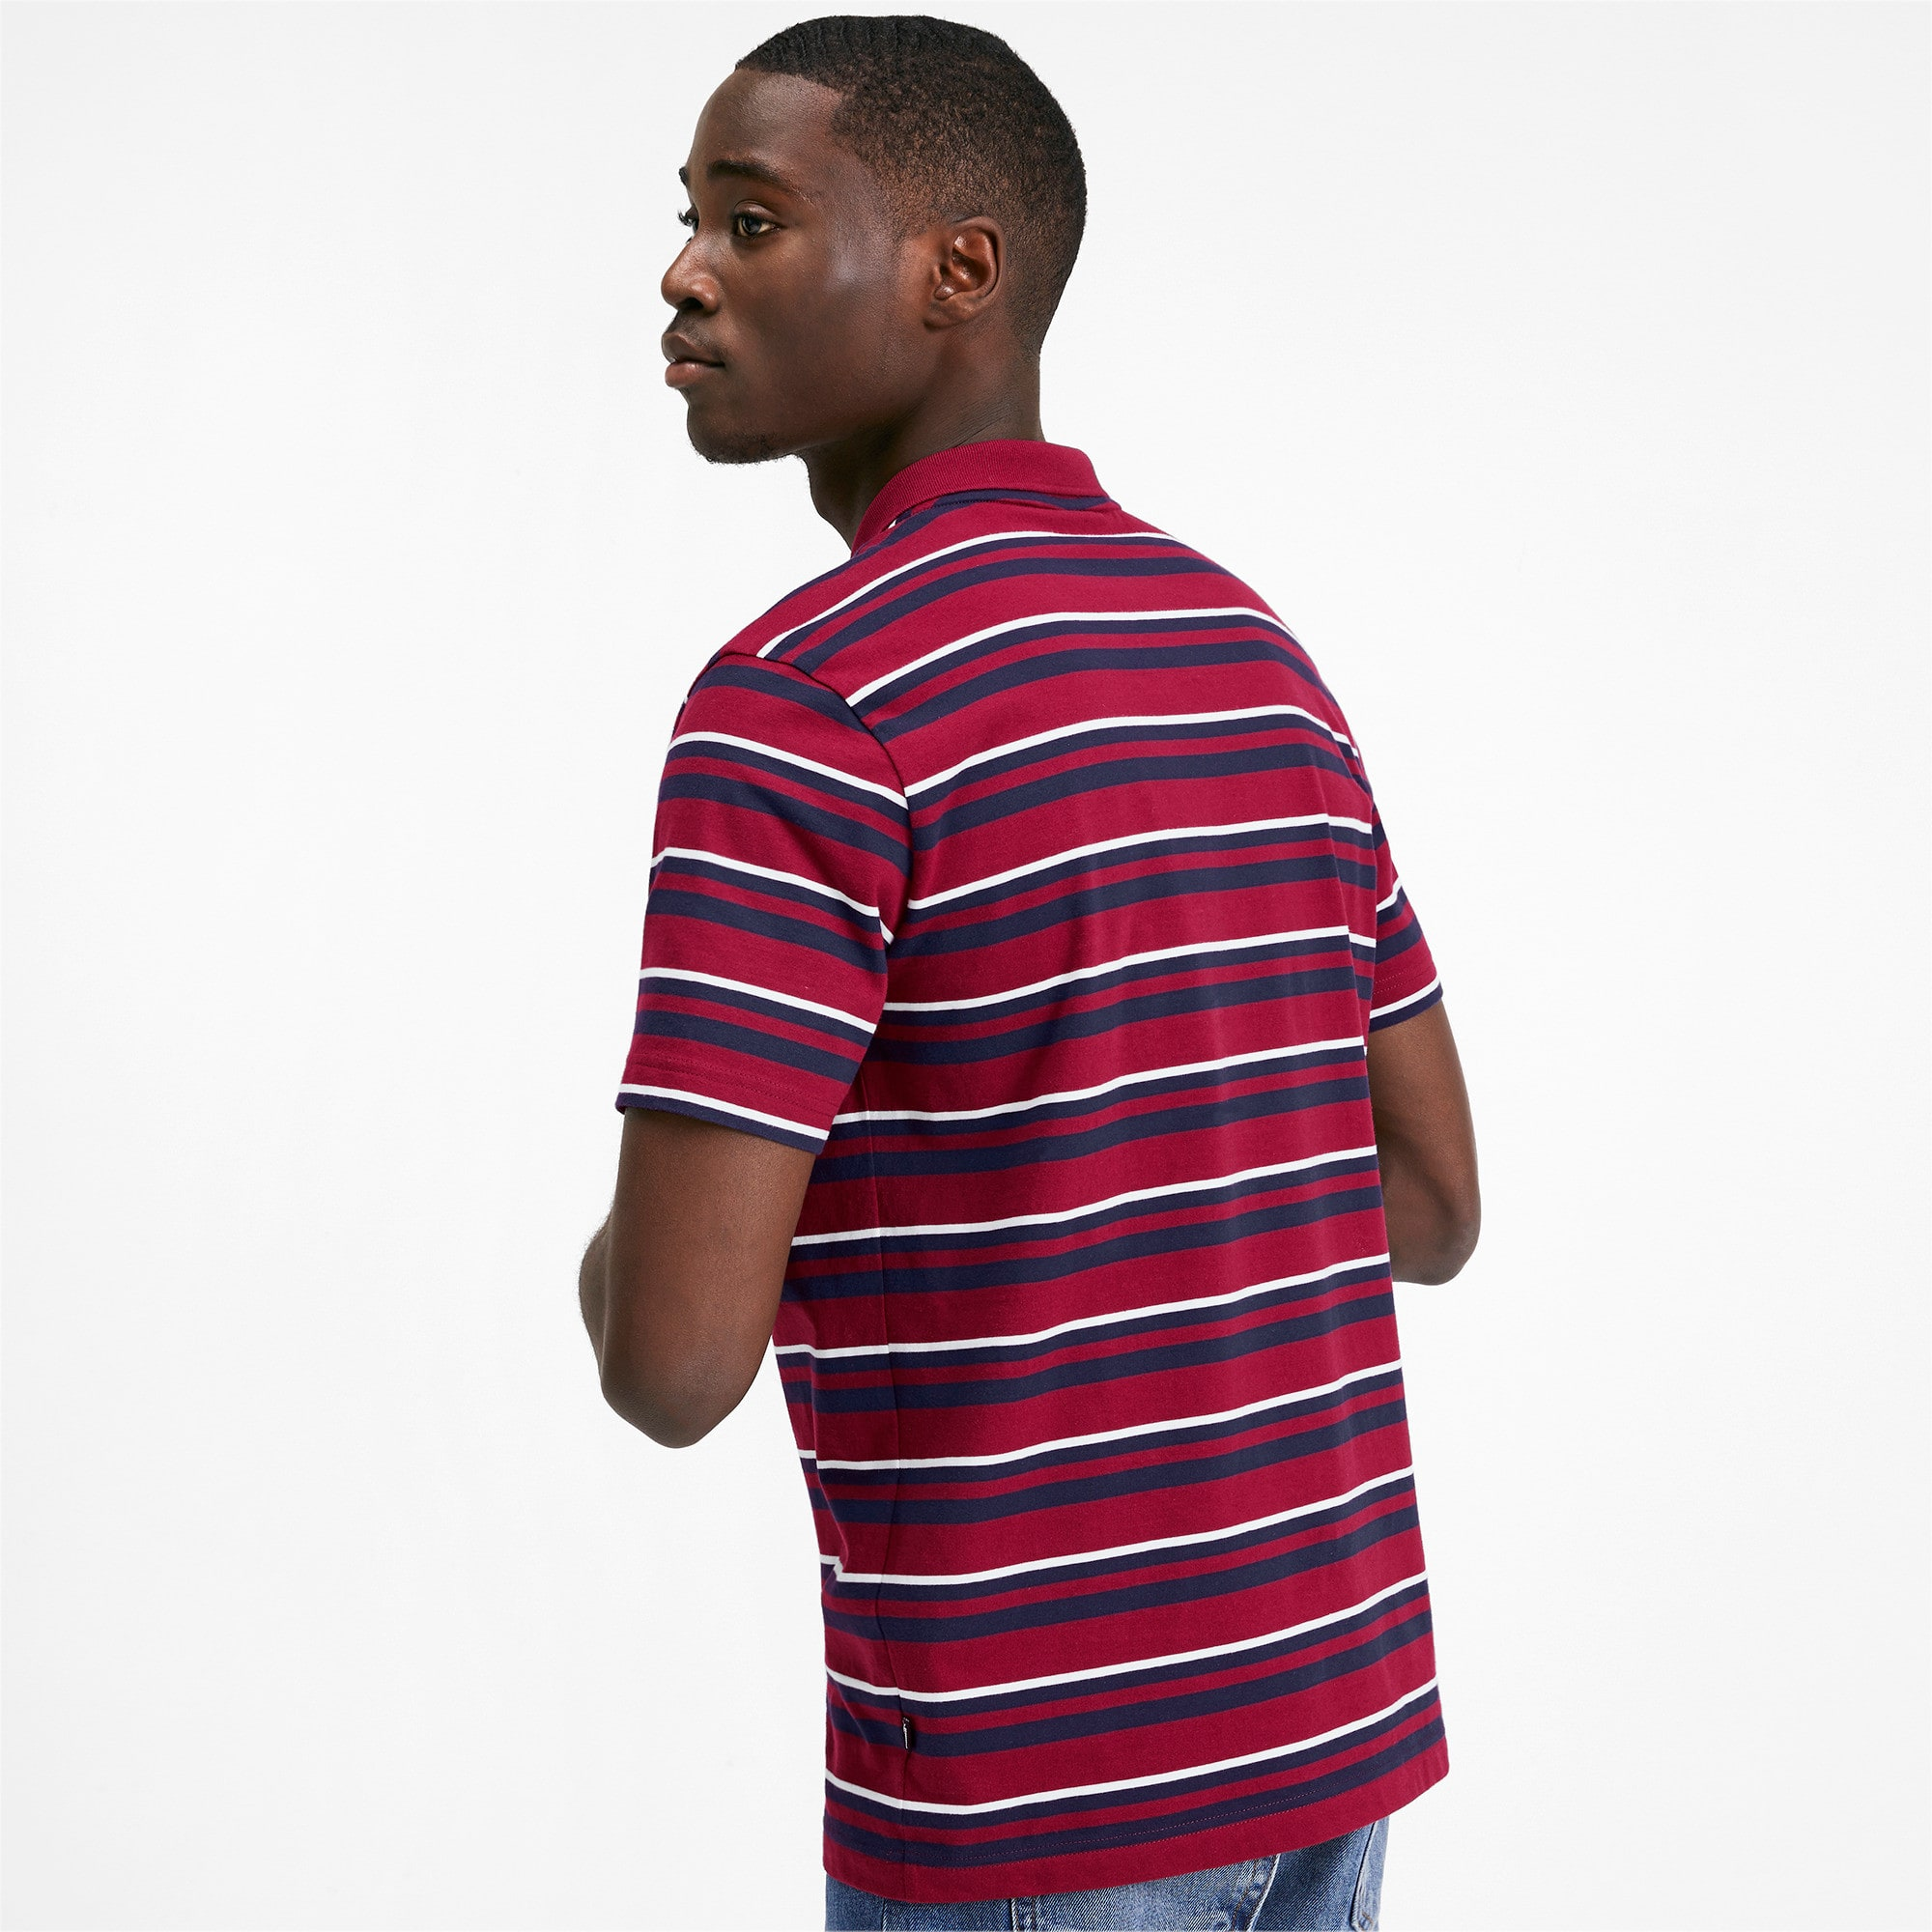 Thumbnail 3 of ESS+ Striped J Men's Polo, Rhubarb, medium